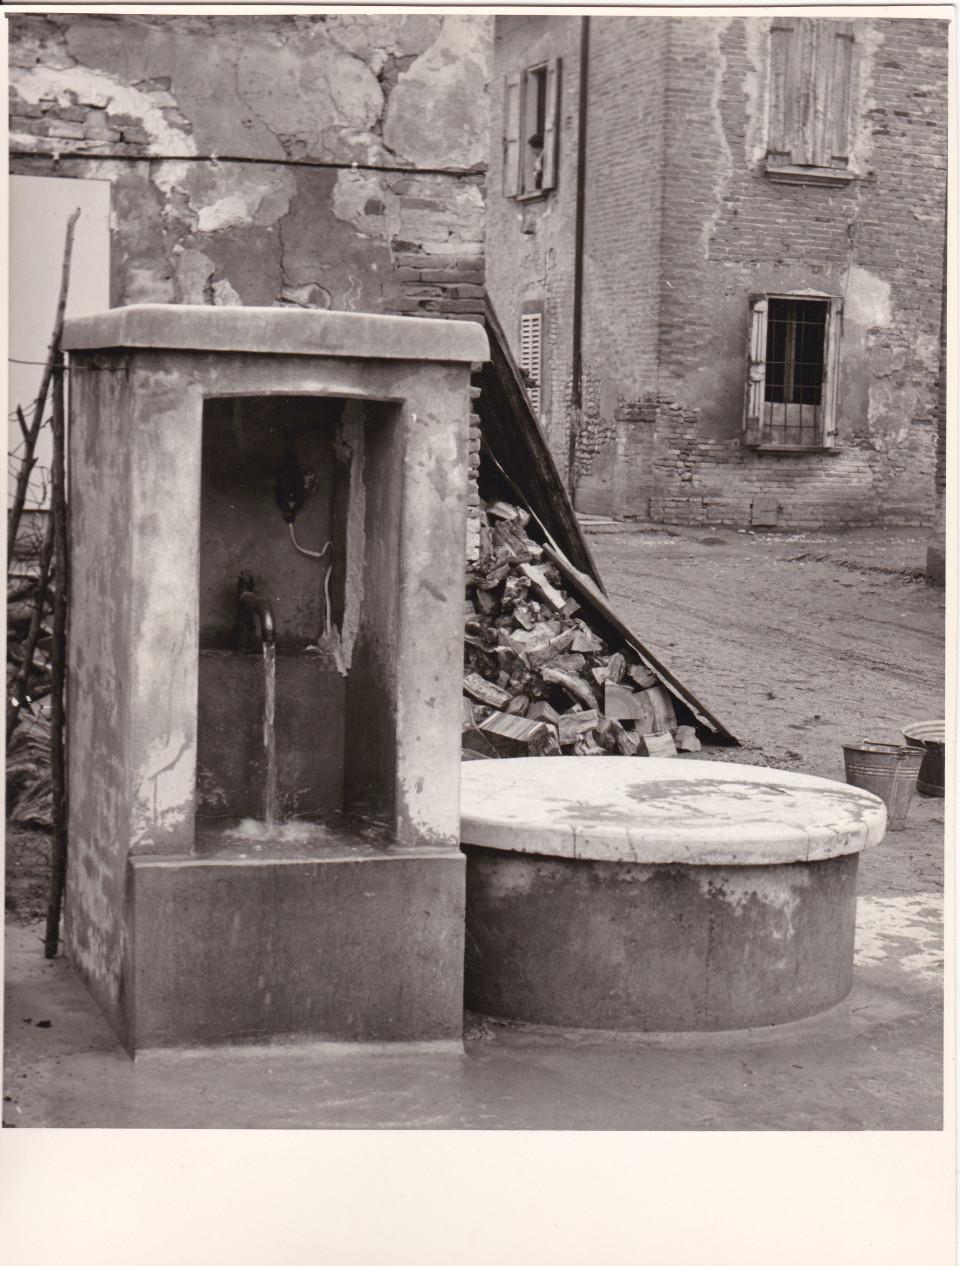 Fabbreria : La fontana